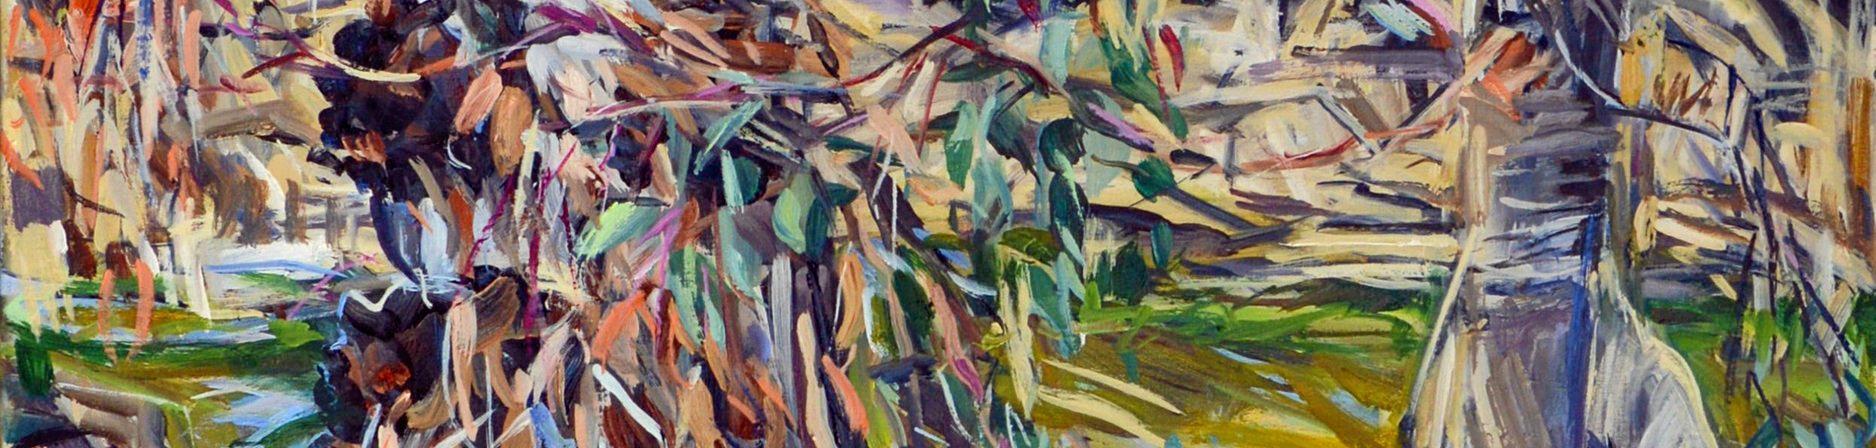 Brigalow Creek Evening (Detail) by Marvene Ash at Maroochydore Library ArtSpace.